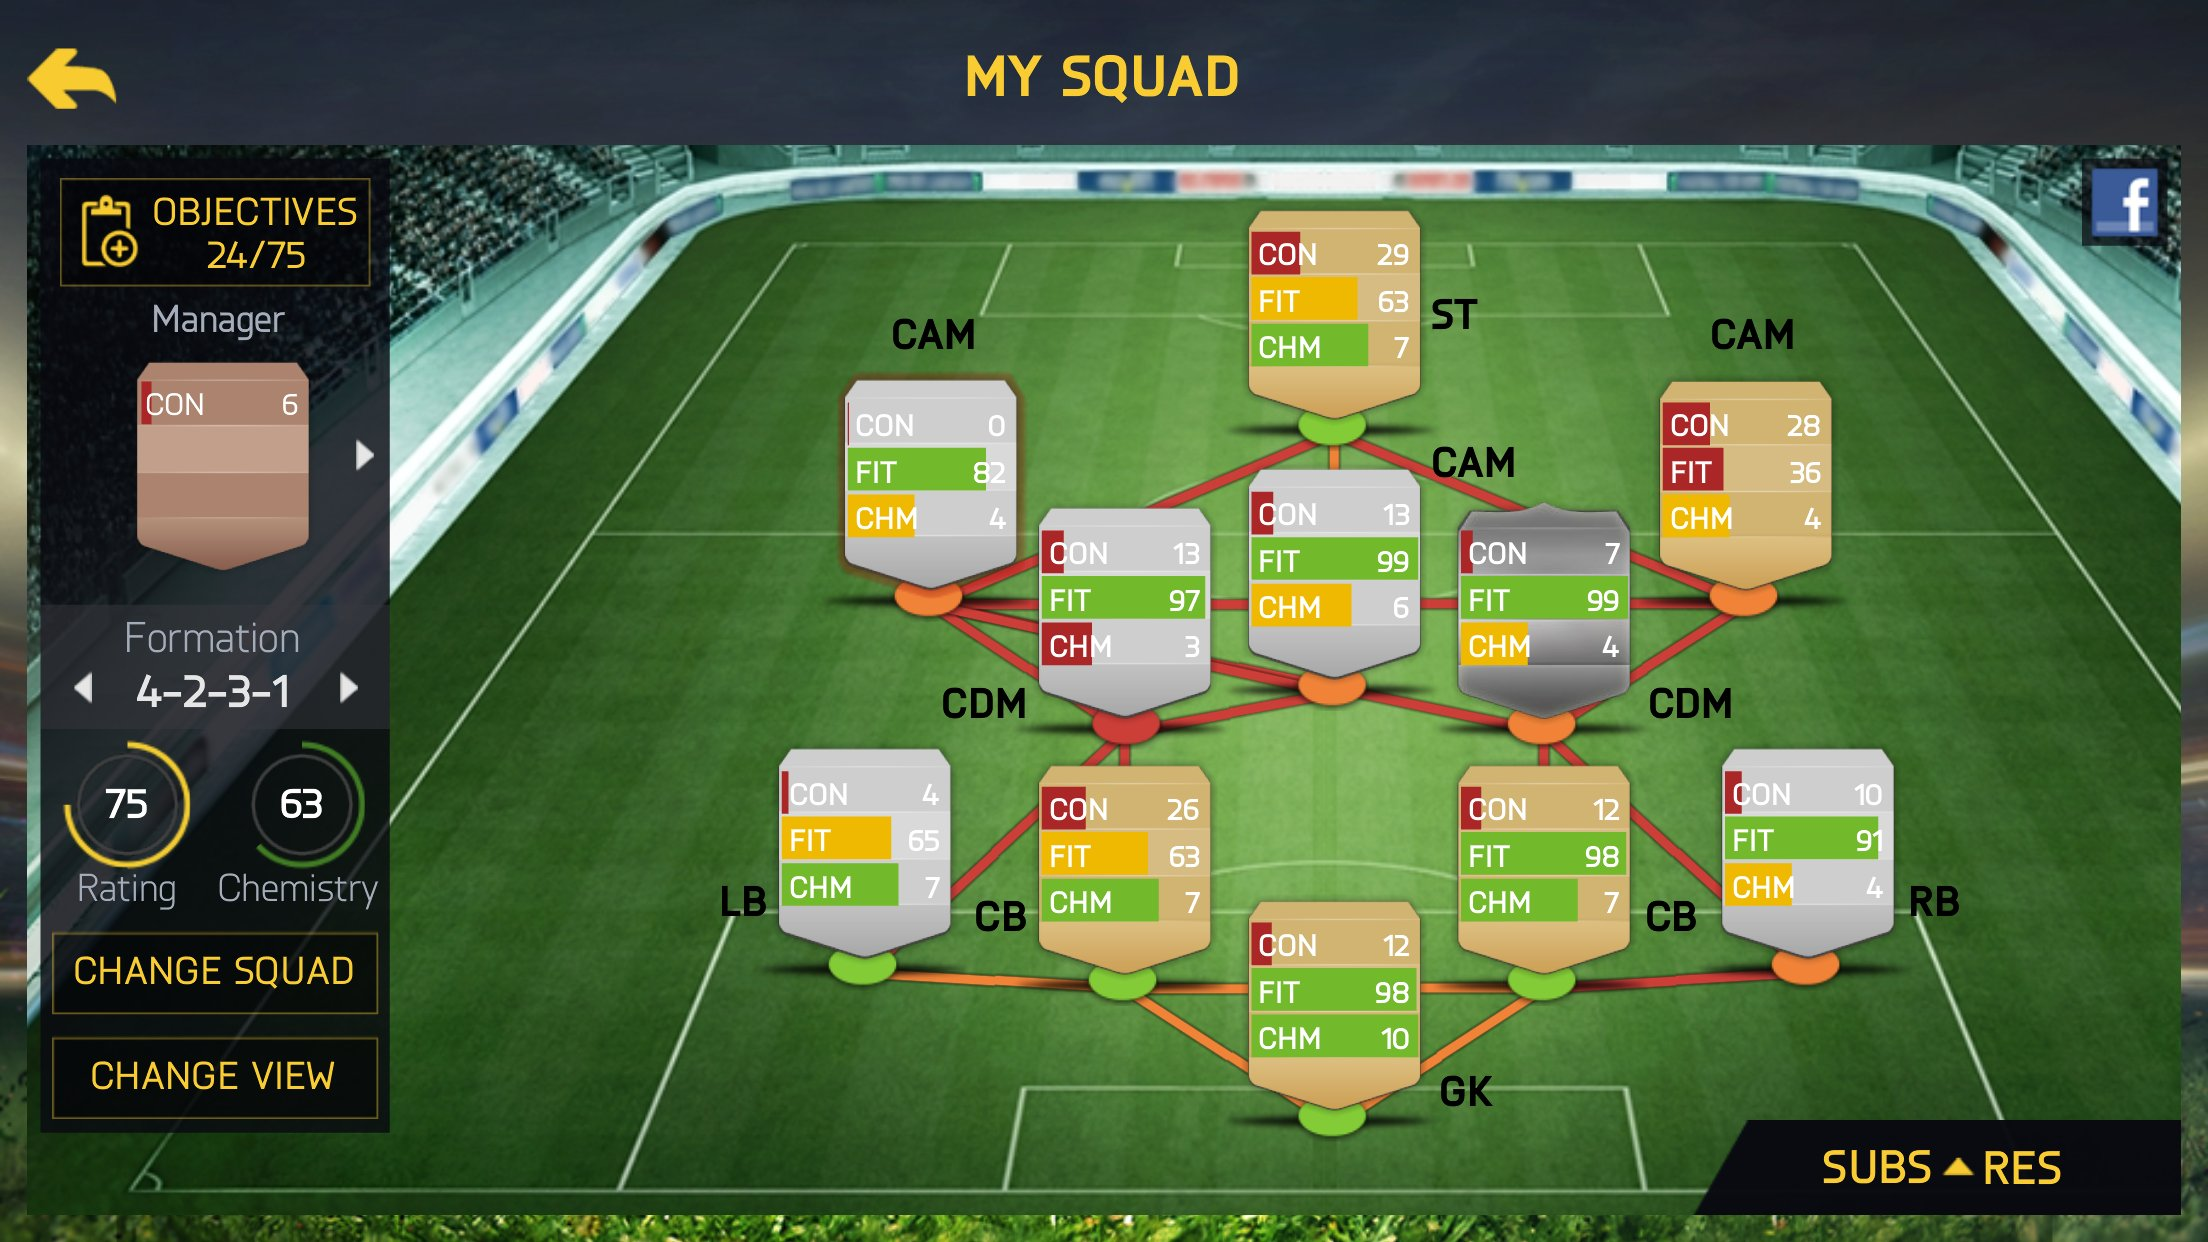 fifa team: